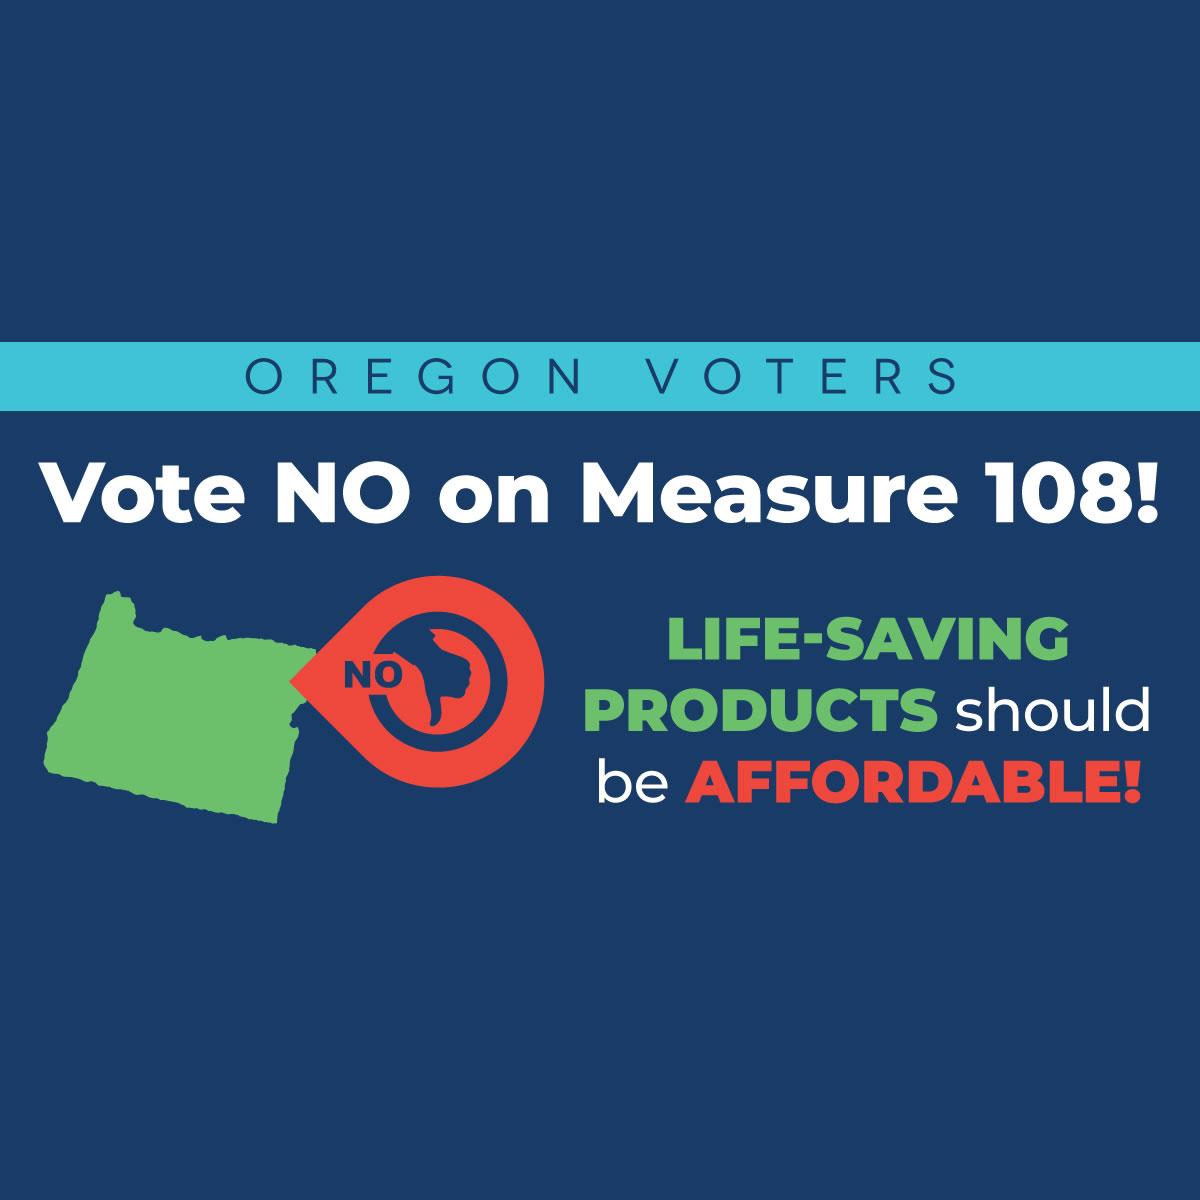 No on Oregon Measure 108